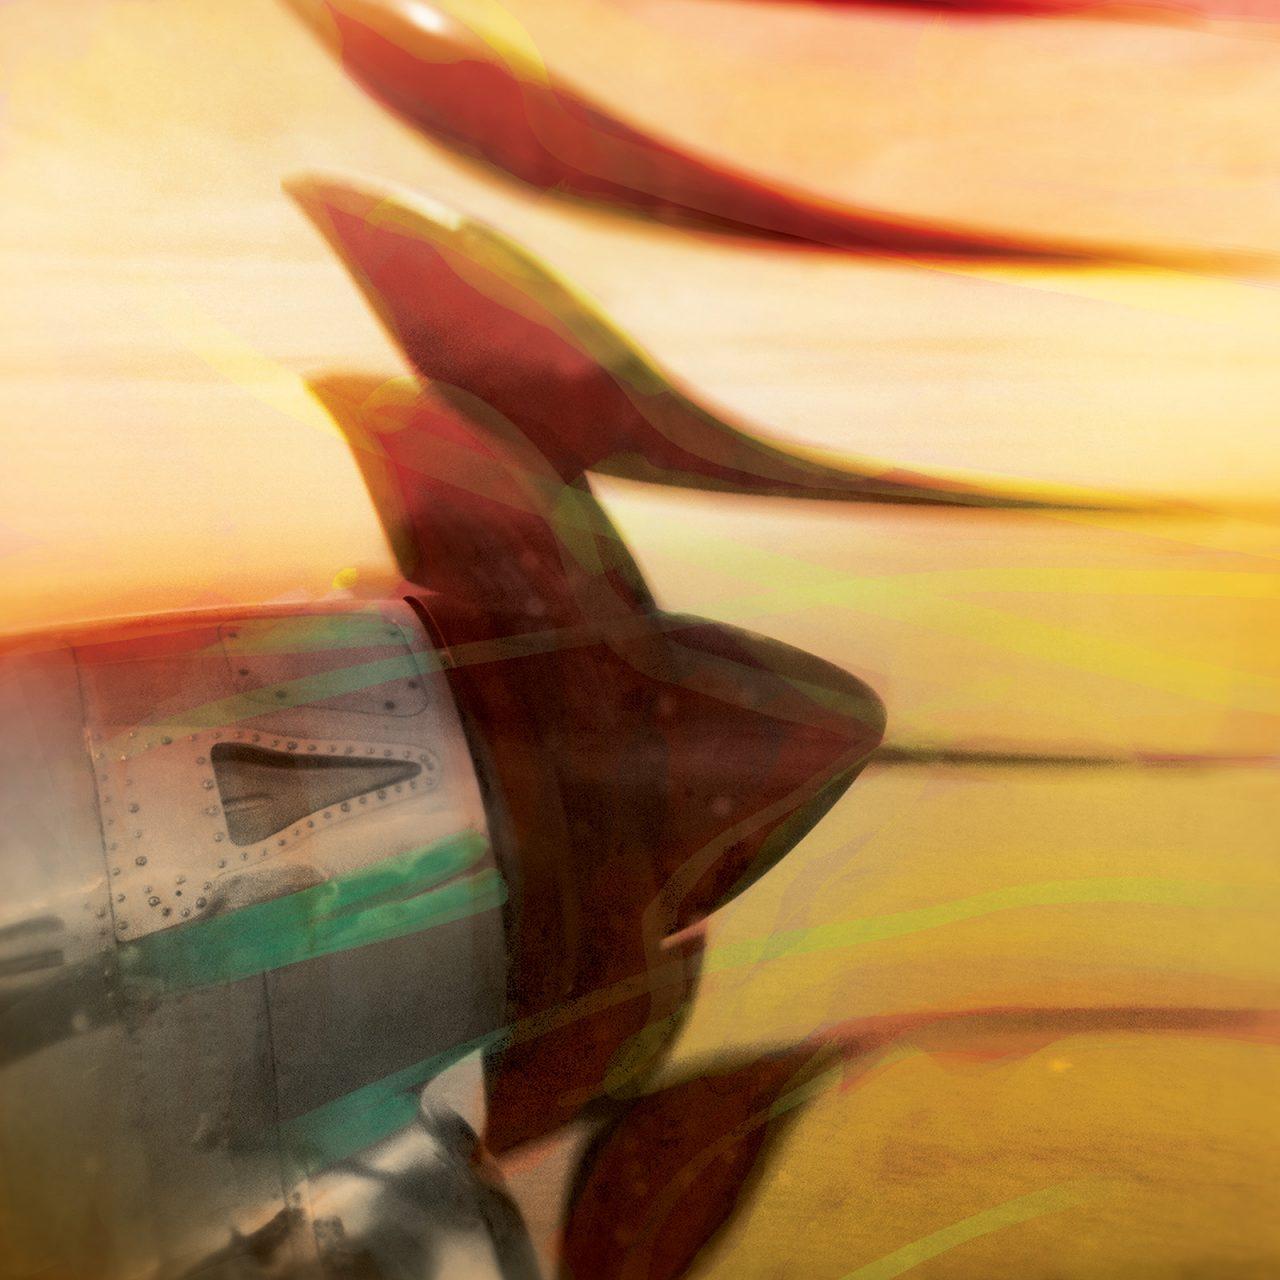 LaserKill-NowBoarding-1280x1280.jpg